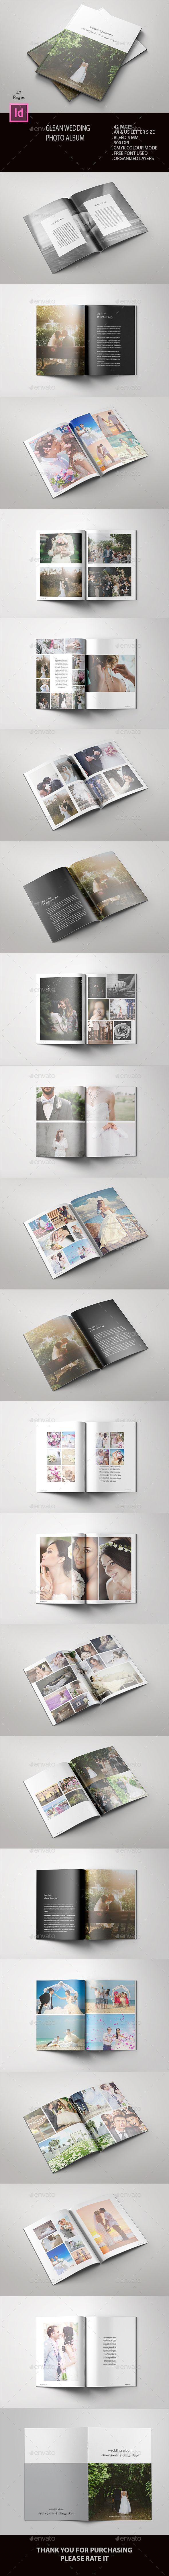 Clean Wedding Album Designed using Adobe Indesign format, totaling 42 pages. Clean, elegant, simple and stylish photo album, desig #WeddingAlbums